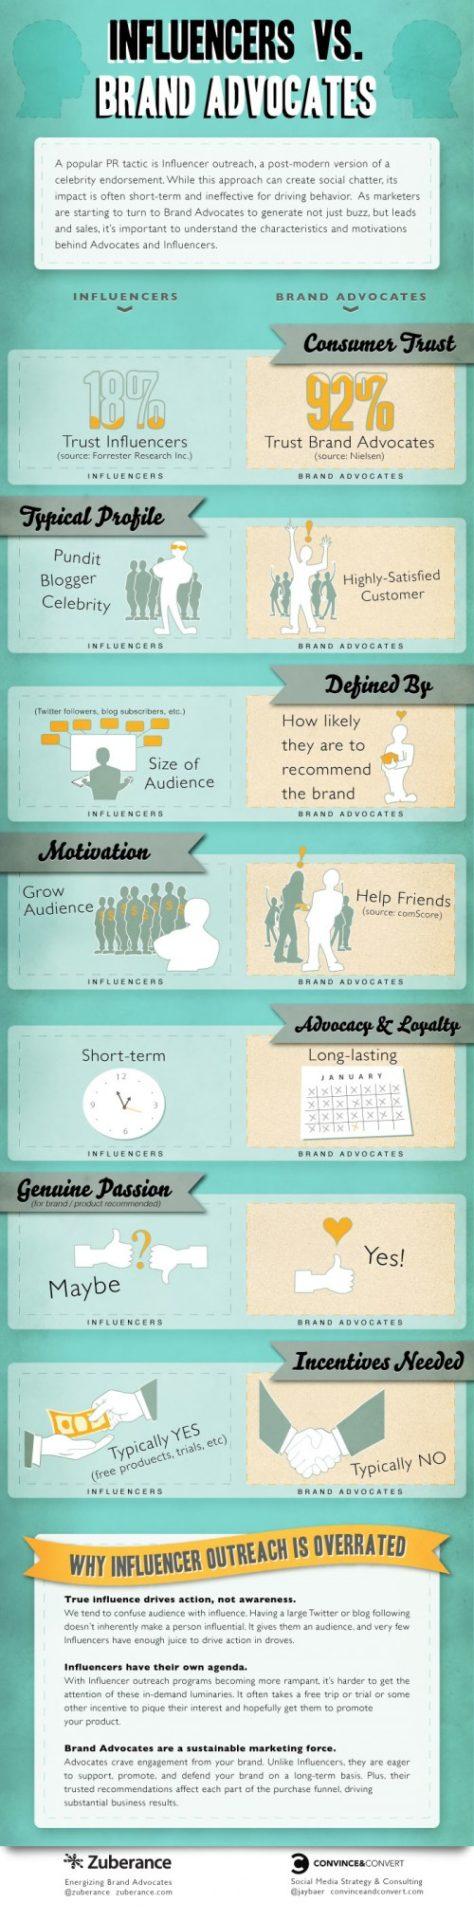 Influencers versus Advocates Infographic